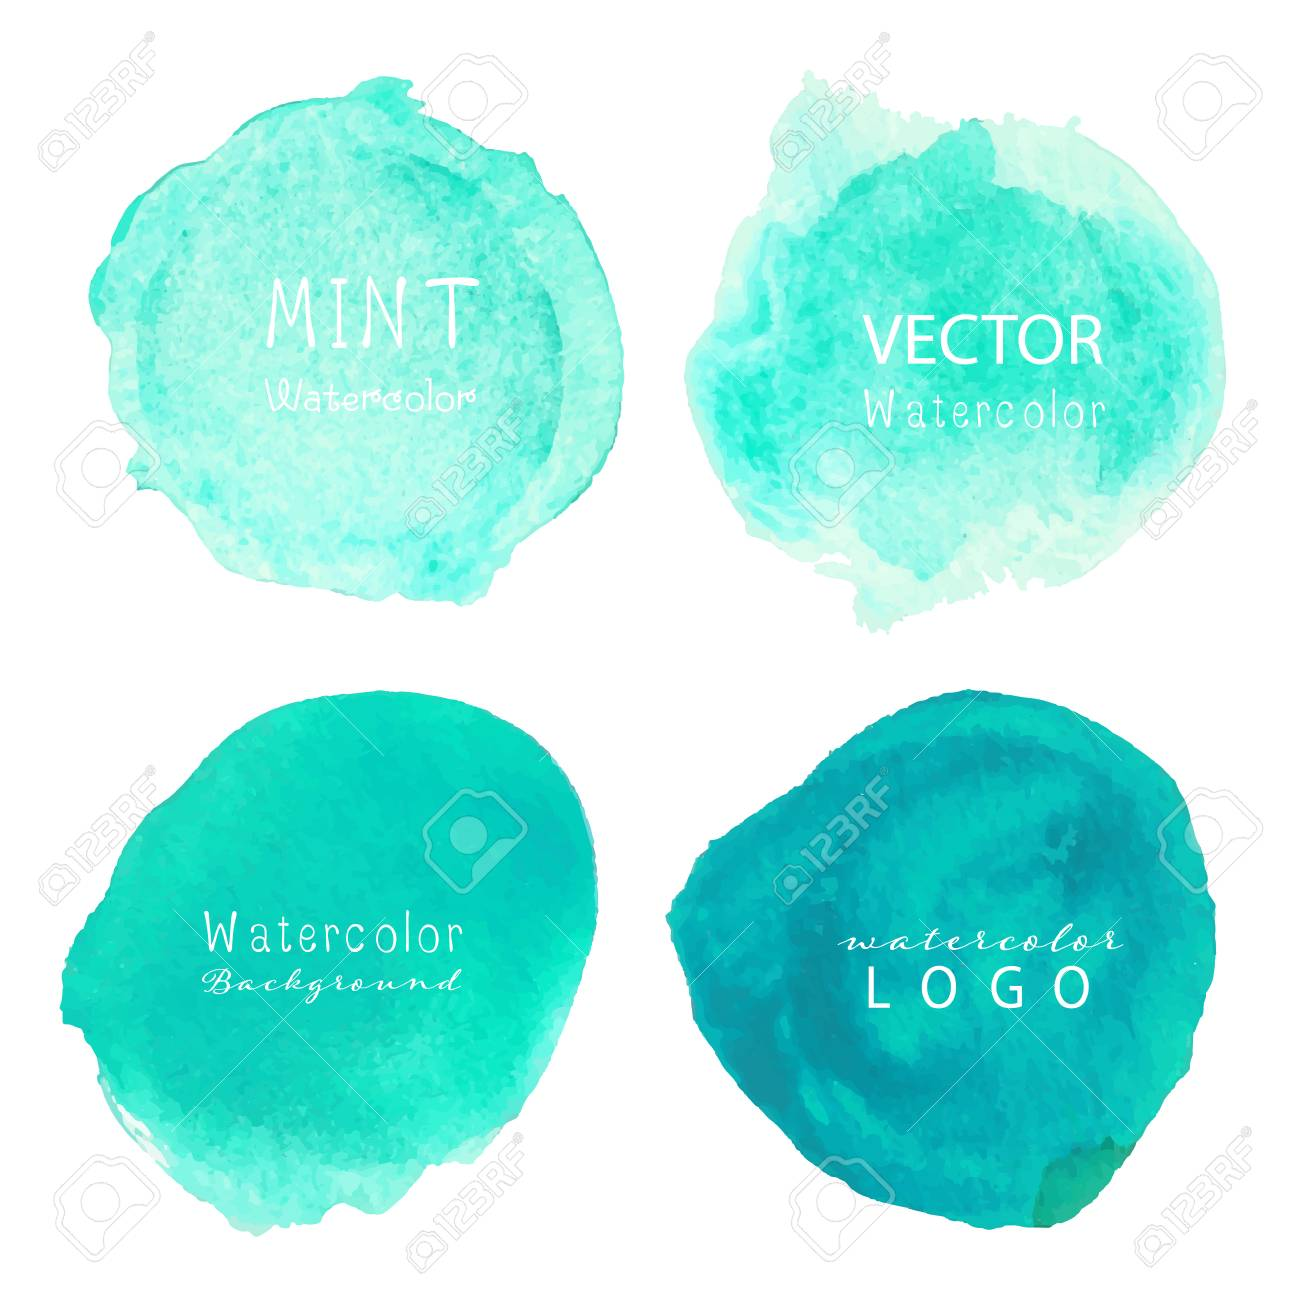 Mint Watercolor Background Pastel Watercolor Logo Vector Illustration